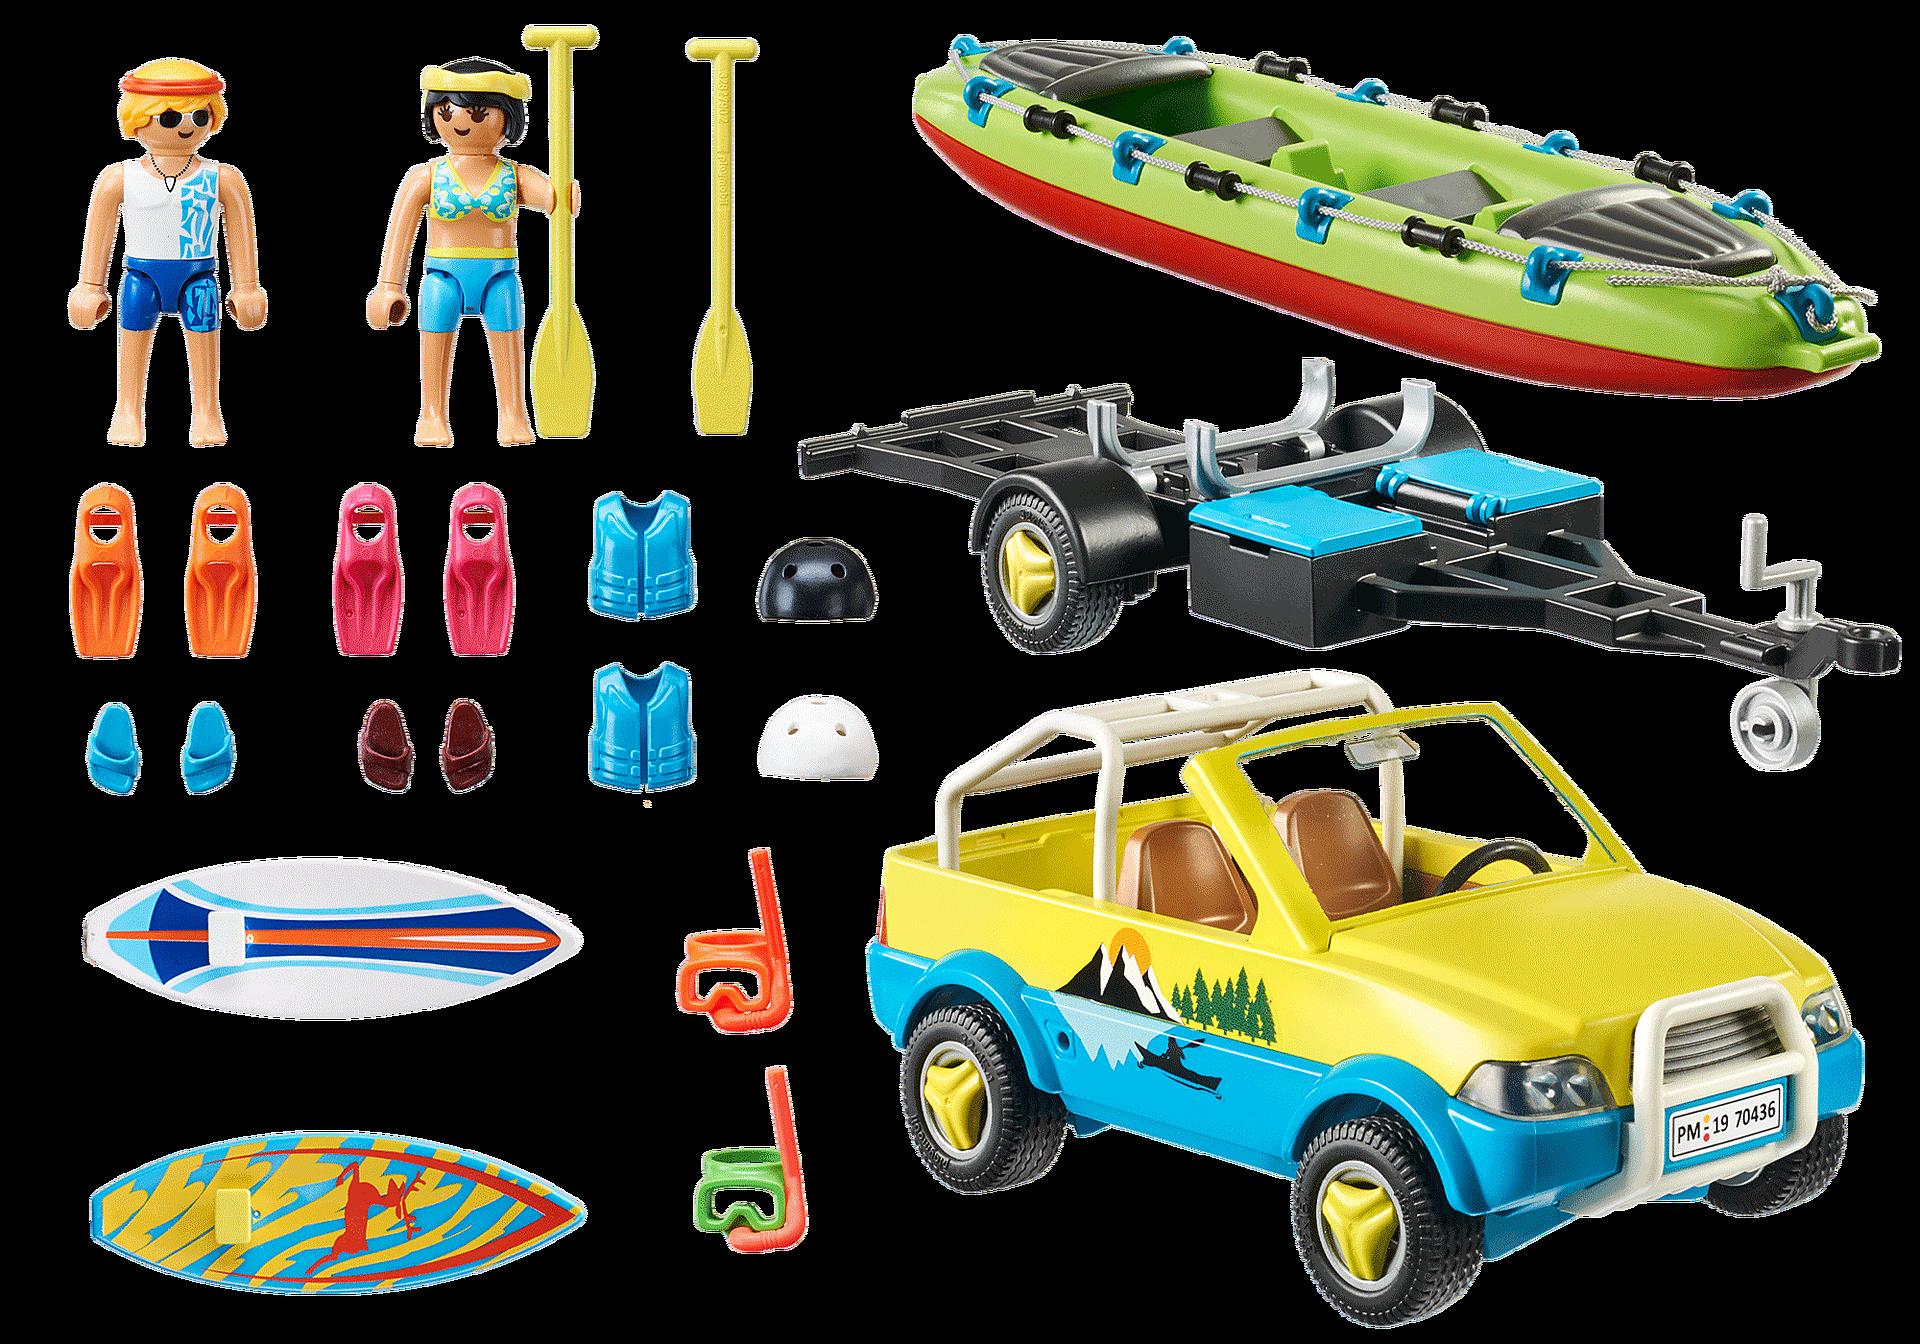 70436 Beach Car with Canoe zoom image3